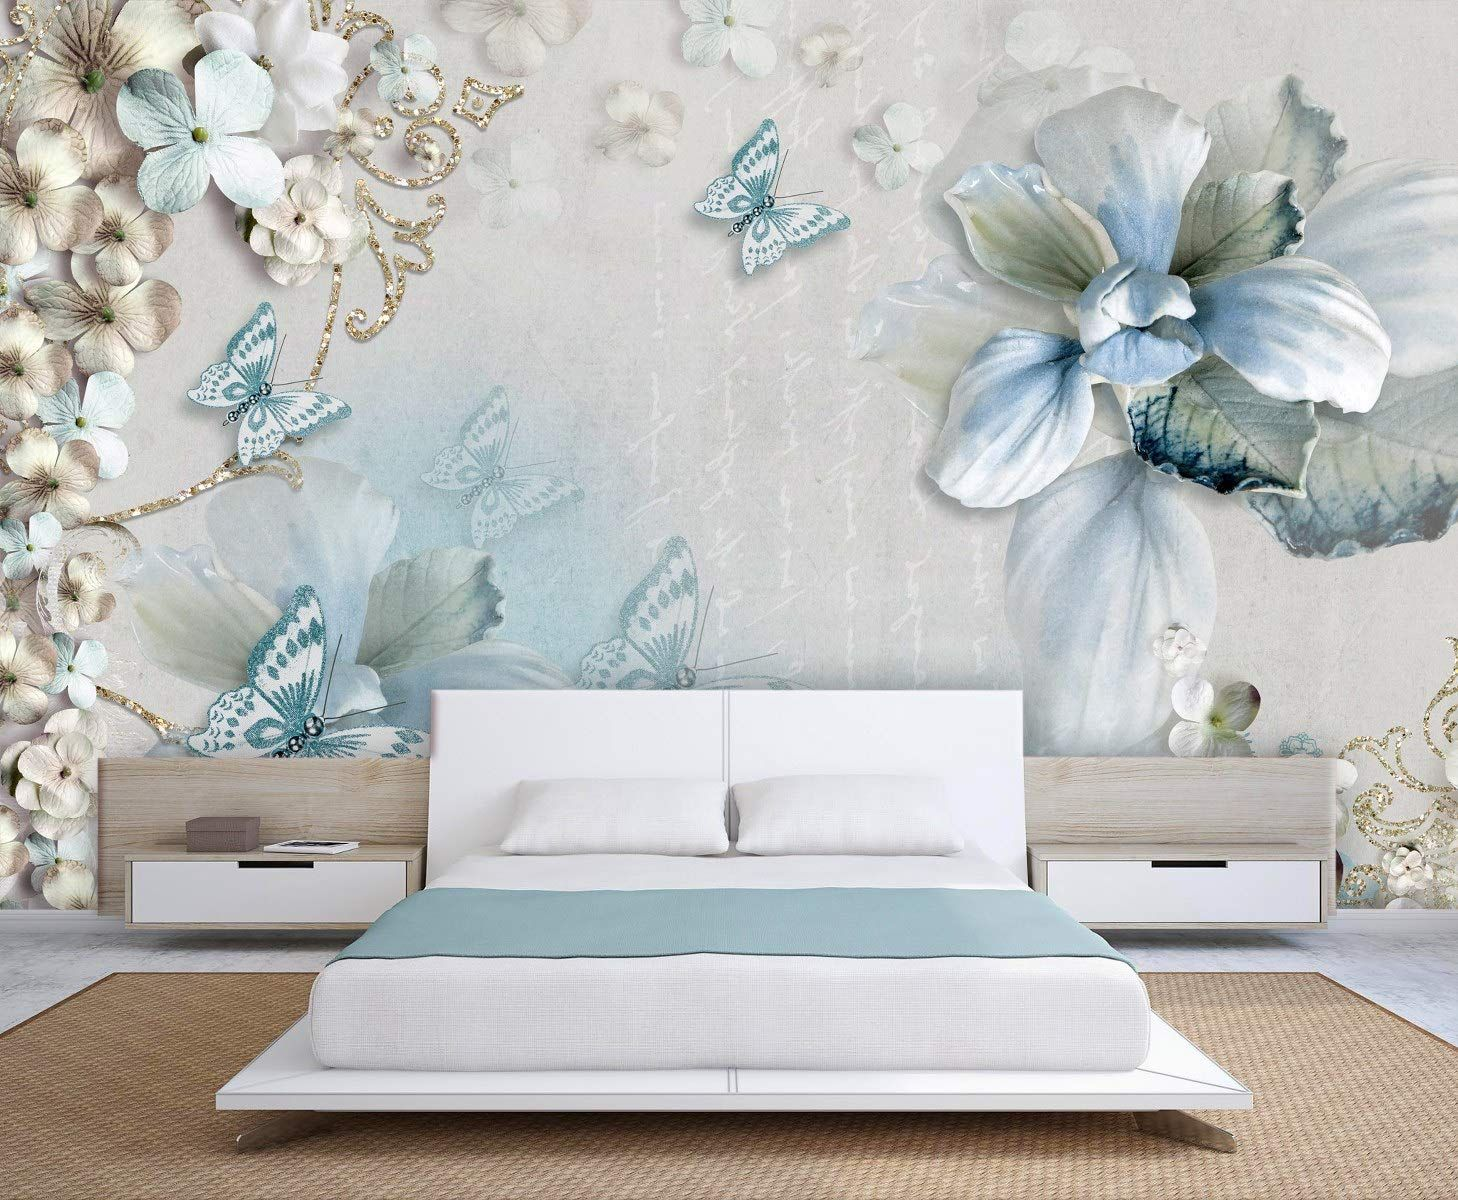 White Brown Flowers Blue Butterflies 3d Wallpaper Beddingroom Livingroom Tvbackground H Wallpaper Decor Blue Butterfly Wallpaper Living Room Designs